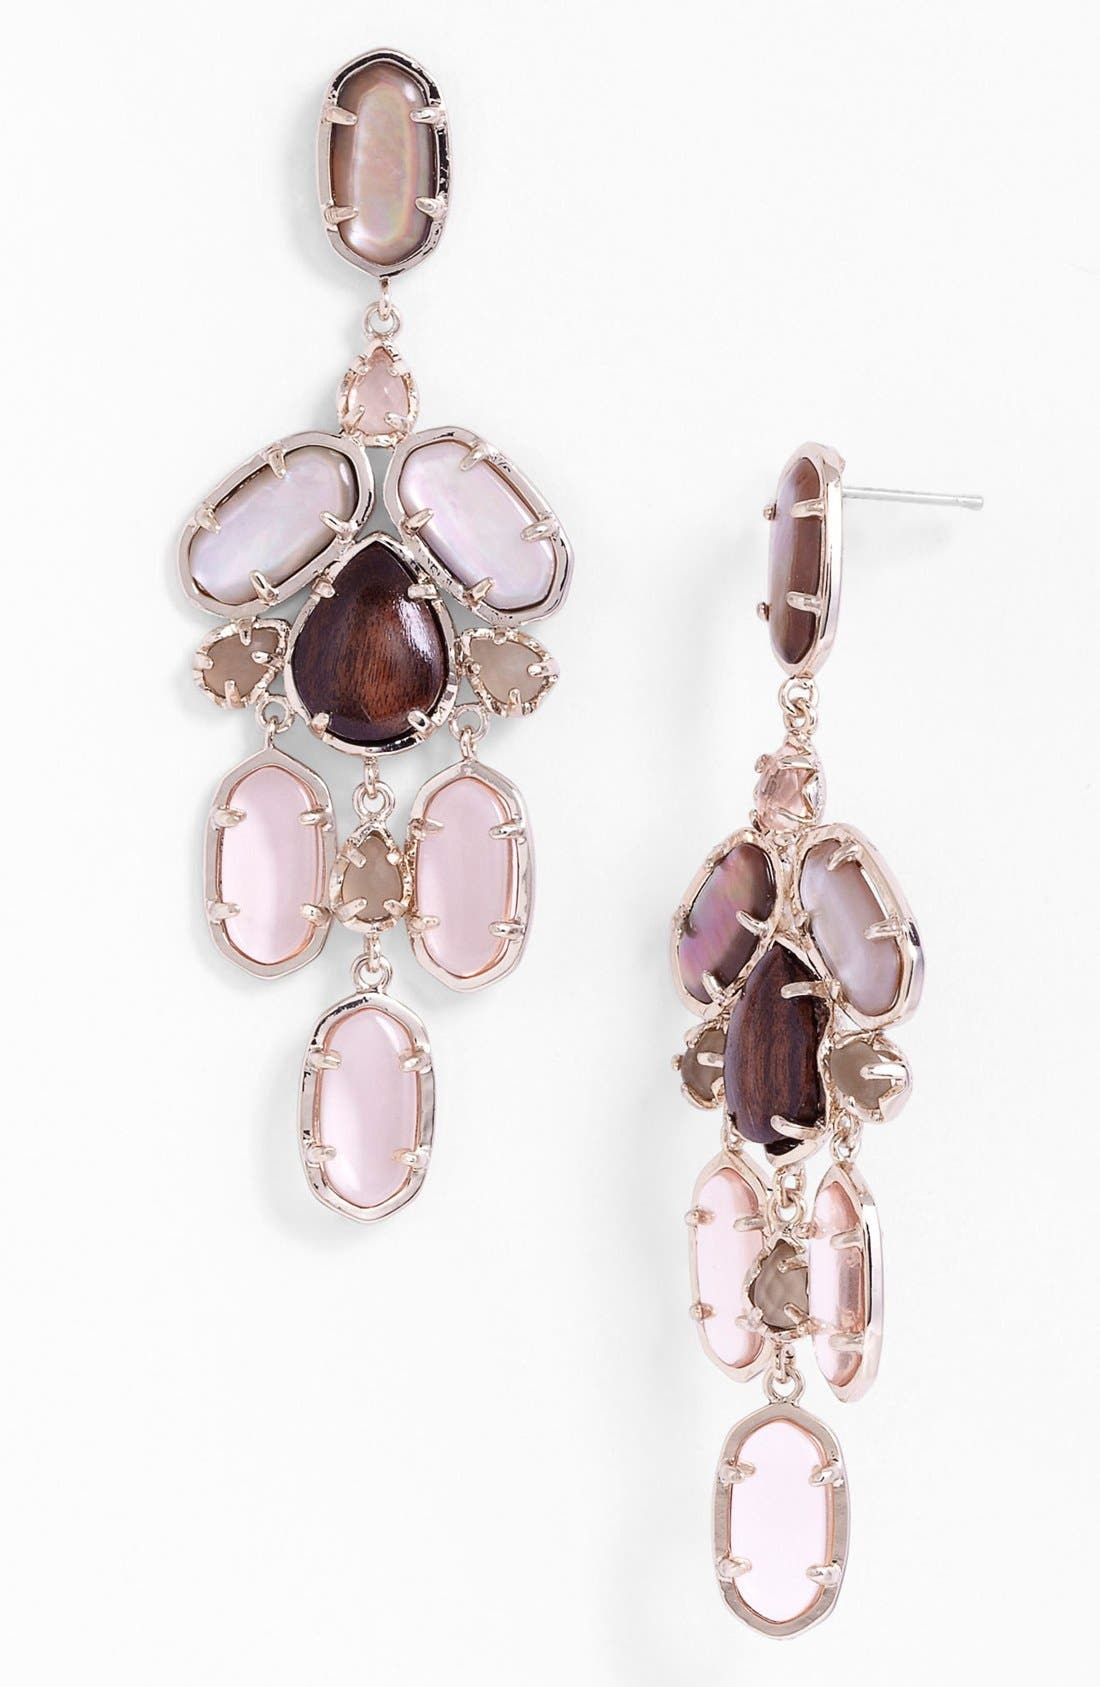 Main Image - Kendra Scott 'Kyra' Mixed Stone Chandelier Earrings